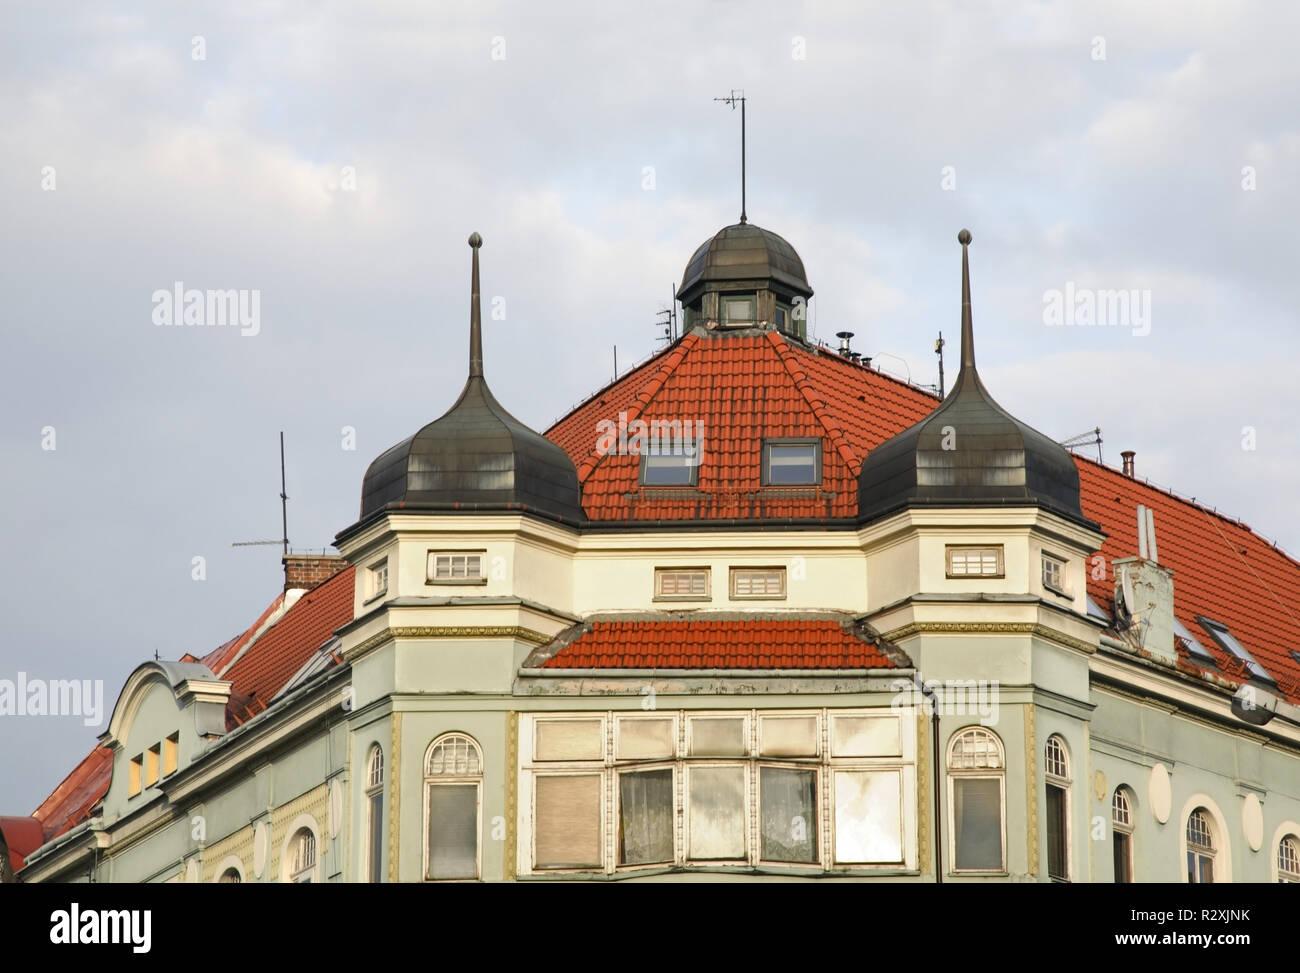 Fragment of old building in Bielsko-Biala. Poland - Stock Image